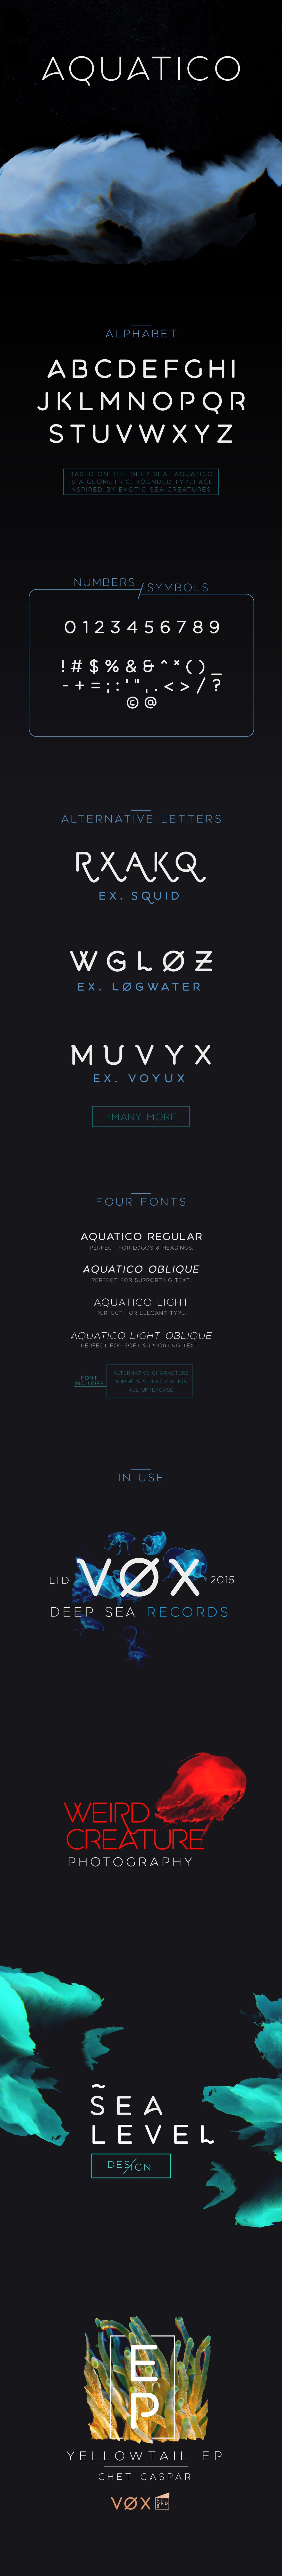 font,free,download,San,serif,new,Free font,Andrew Herndon,Typeface,aquático,sea,creatures,free typeface,logo,design